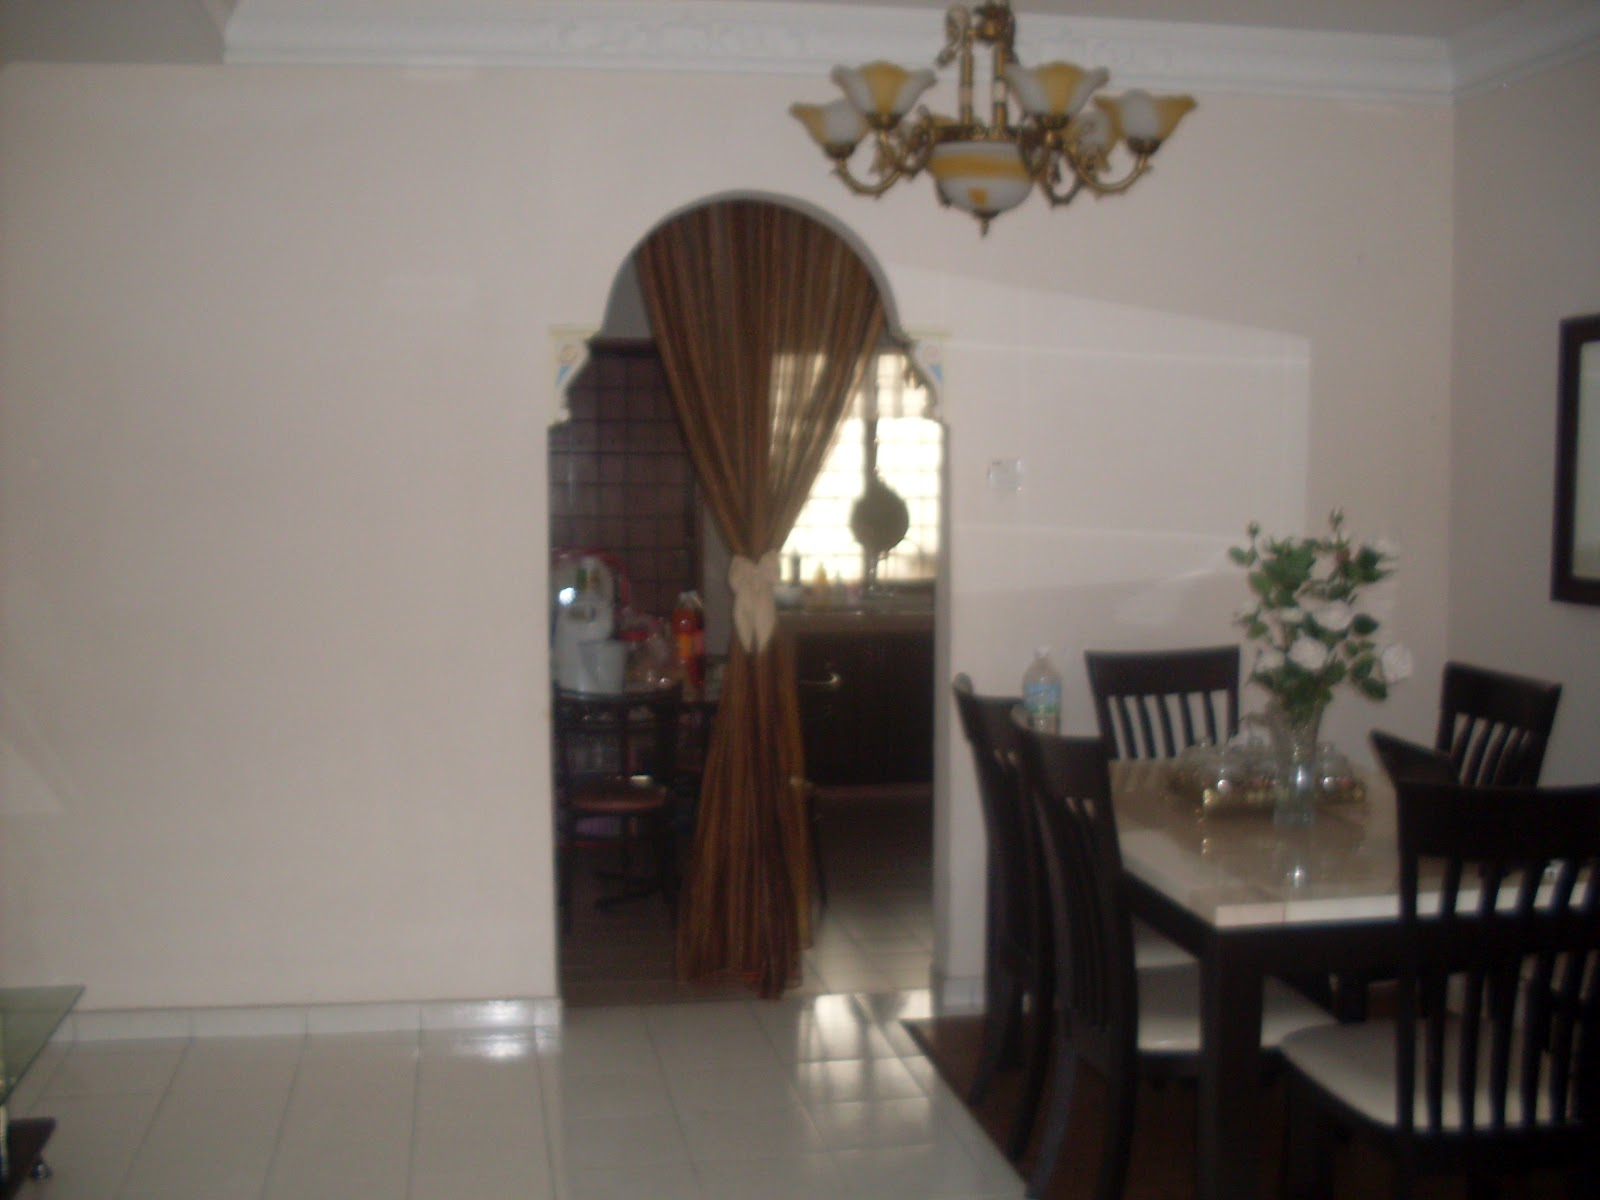 Hiasan Dinding Inspirasi Dekorasi Hiasan Dalaman Rumah | Share The ...